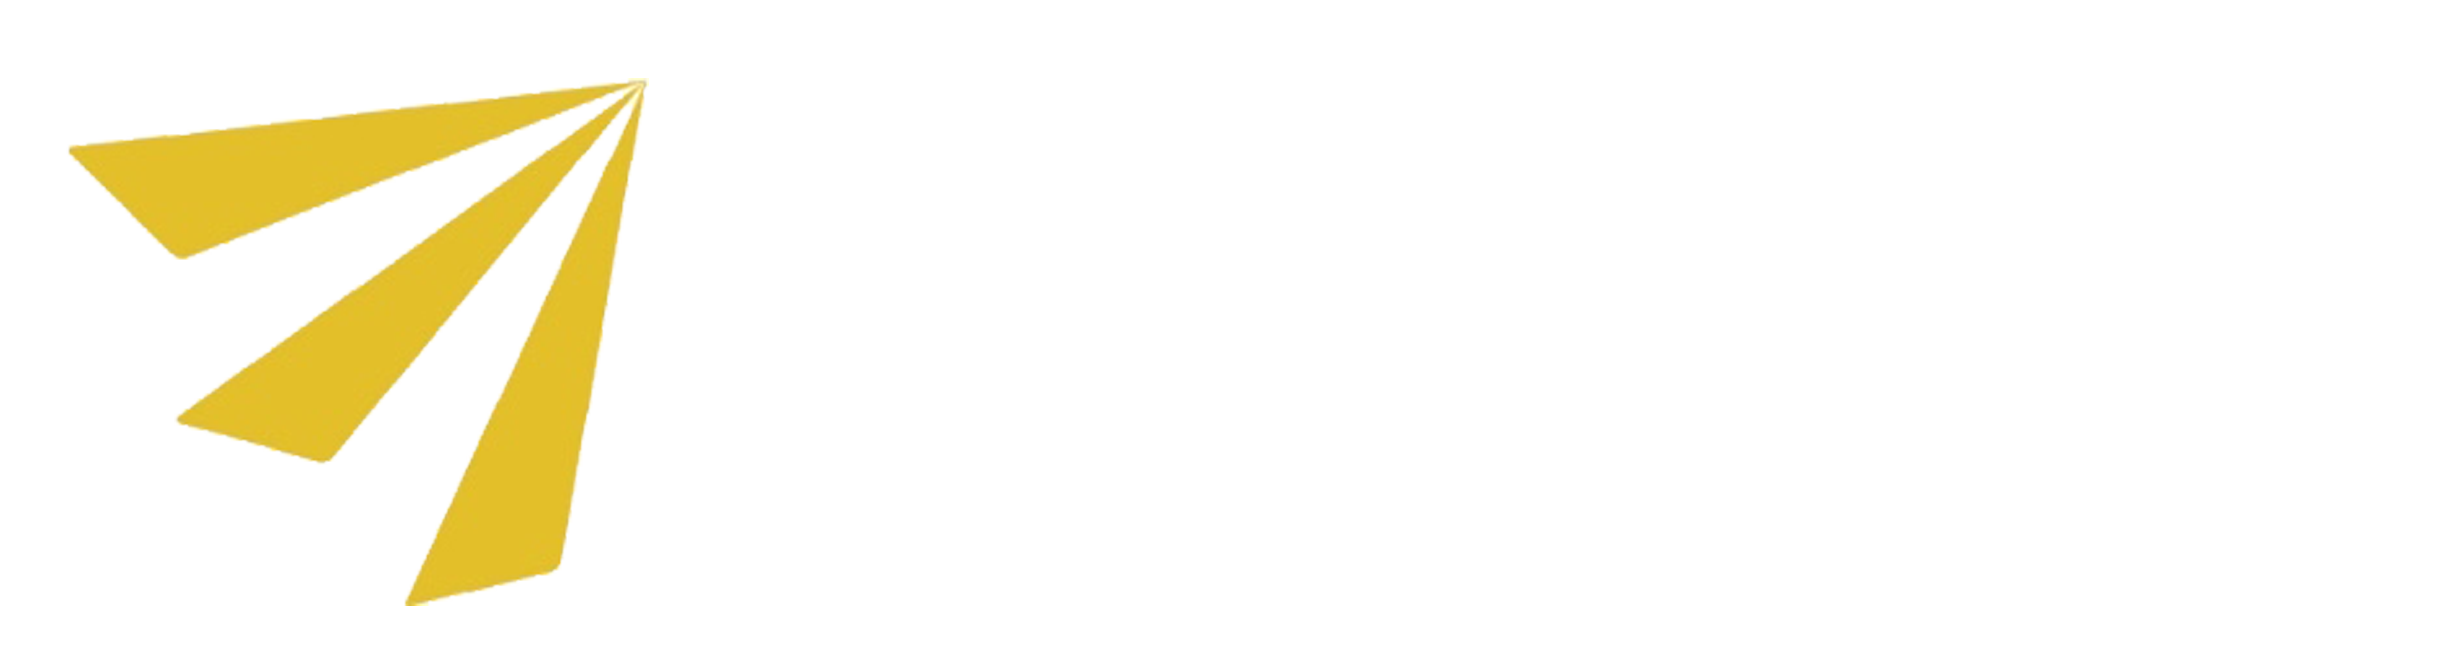 trebleone-logo-white